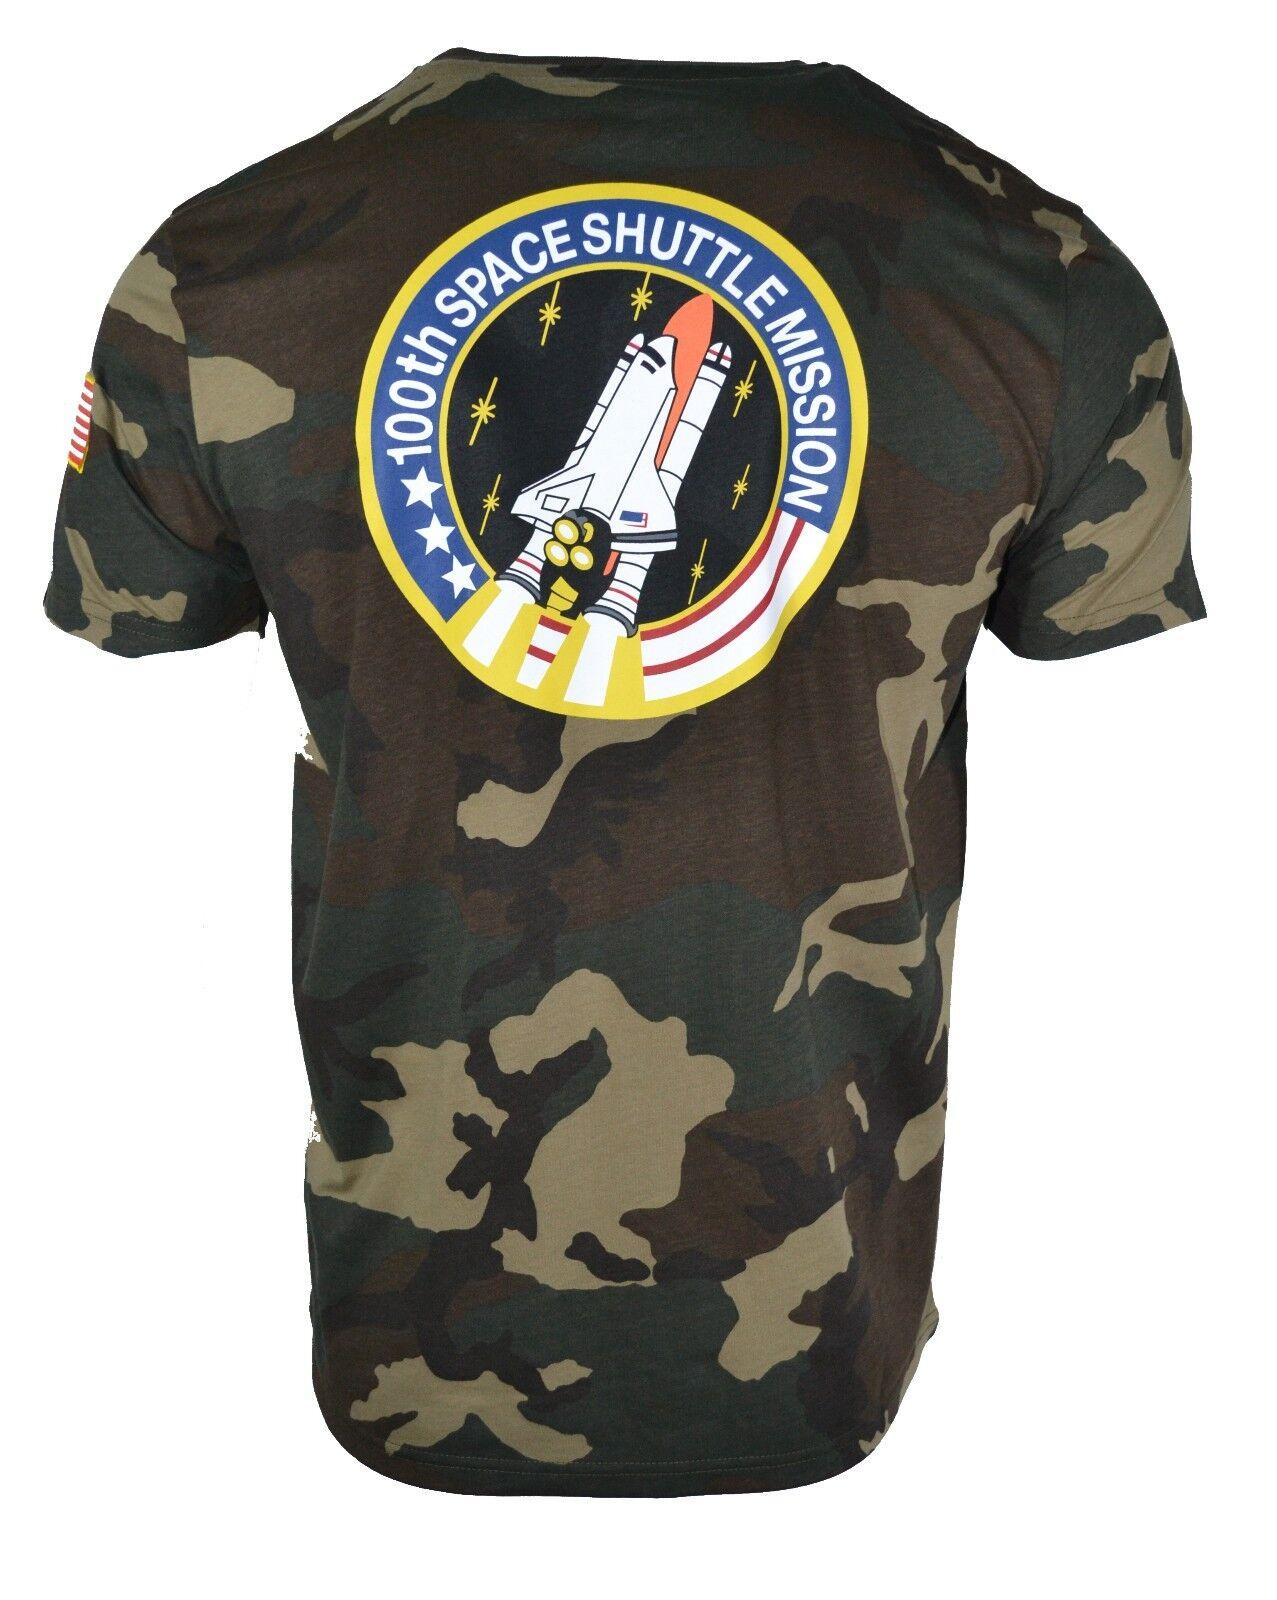 Alpha Industries Shuttle Camo NASA Space Shuttle Industries T-shirt mimetica esercito militare raro 50717c